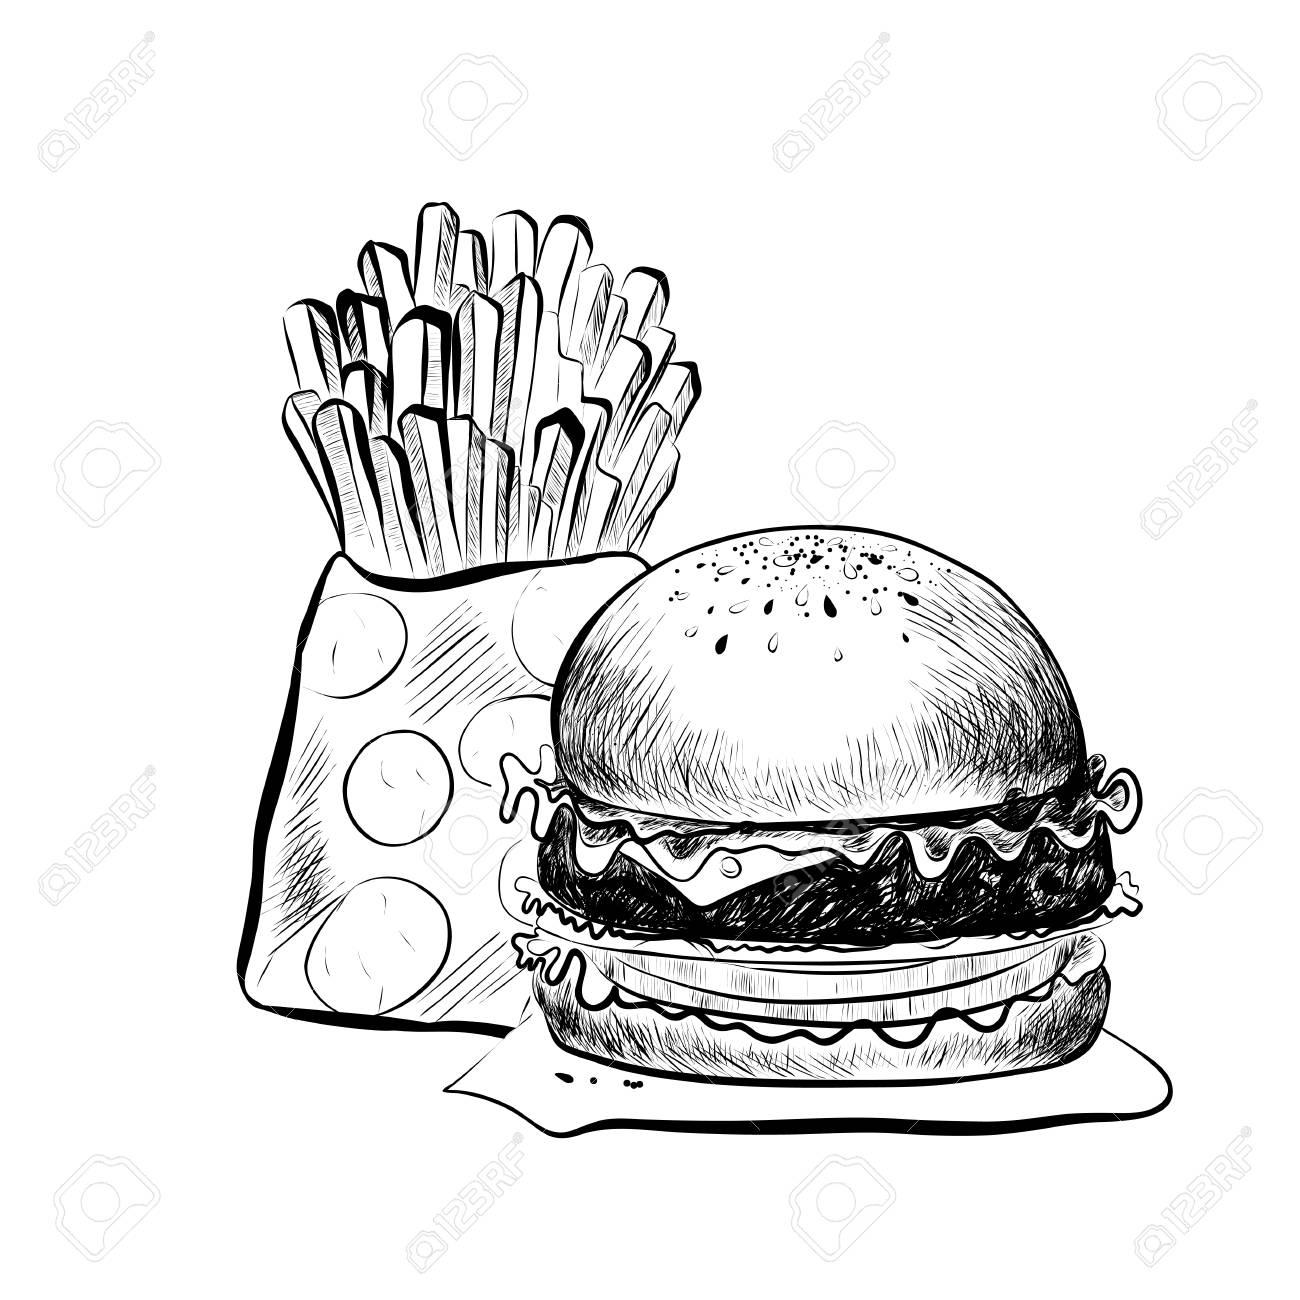 1300x1300 Big Hamburger Or Cheeseburgernd French Fries. Isolated On